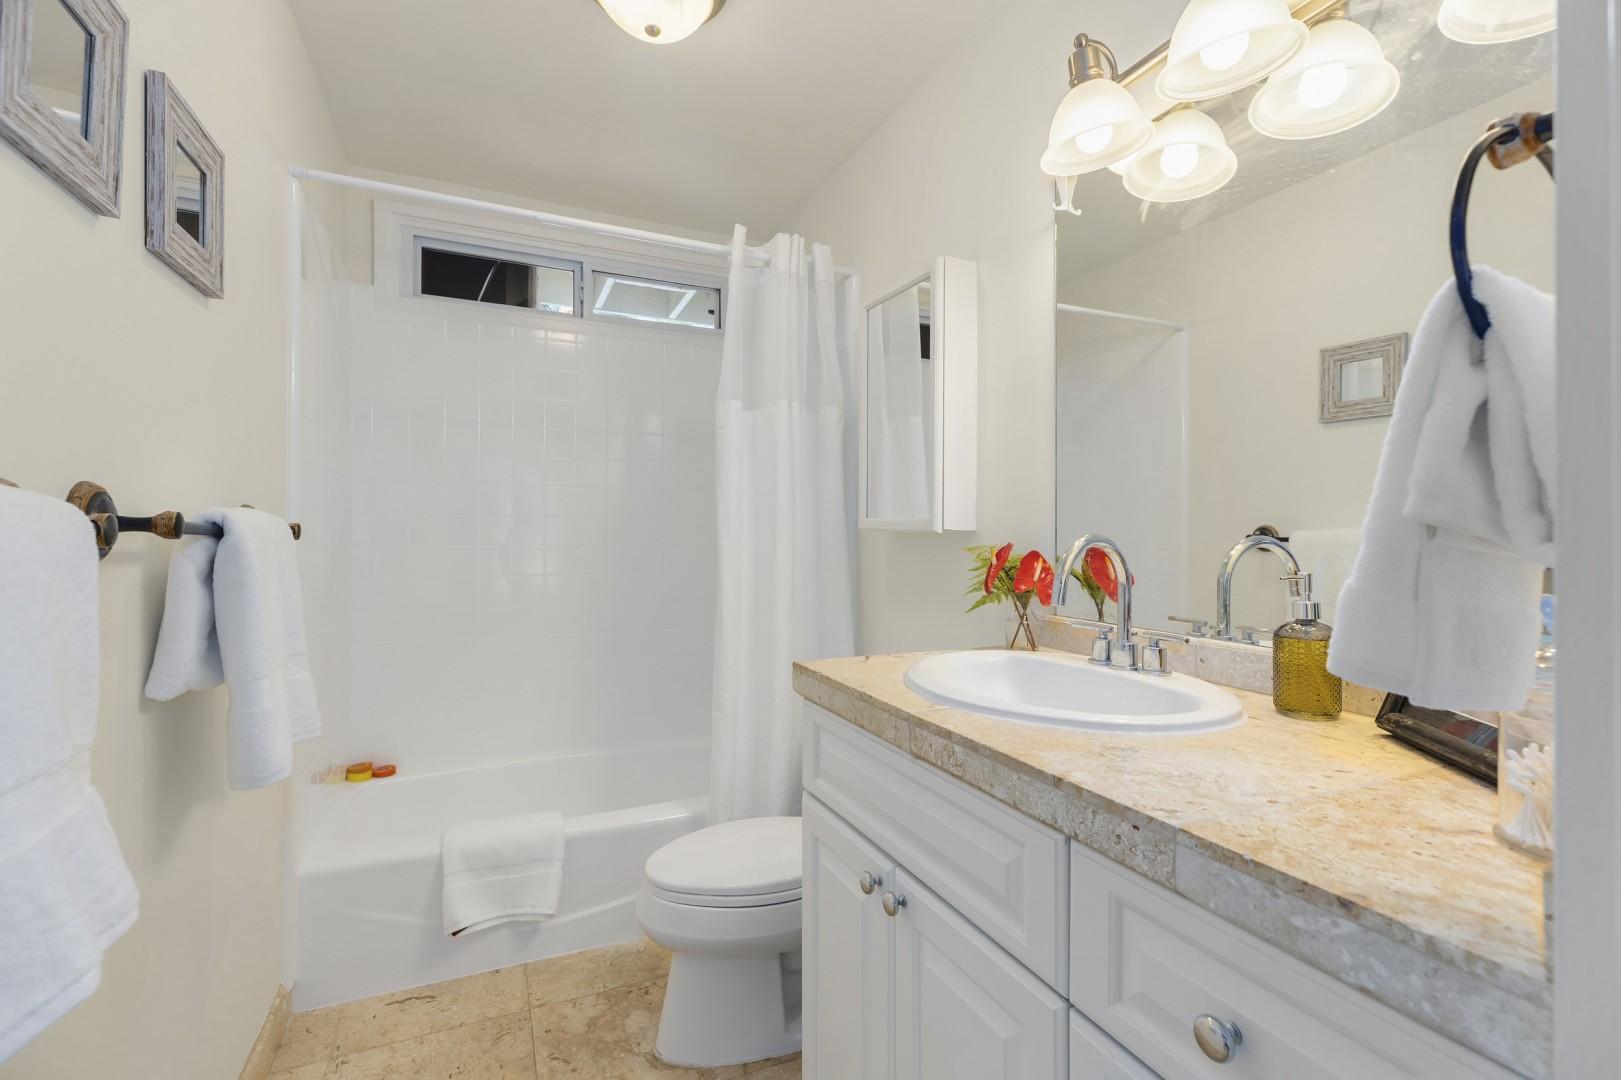 Downstairs Shared Hallway Bathroom